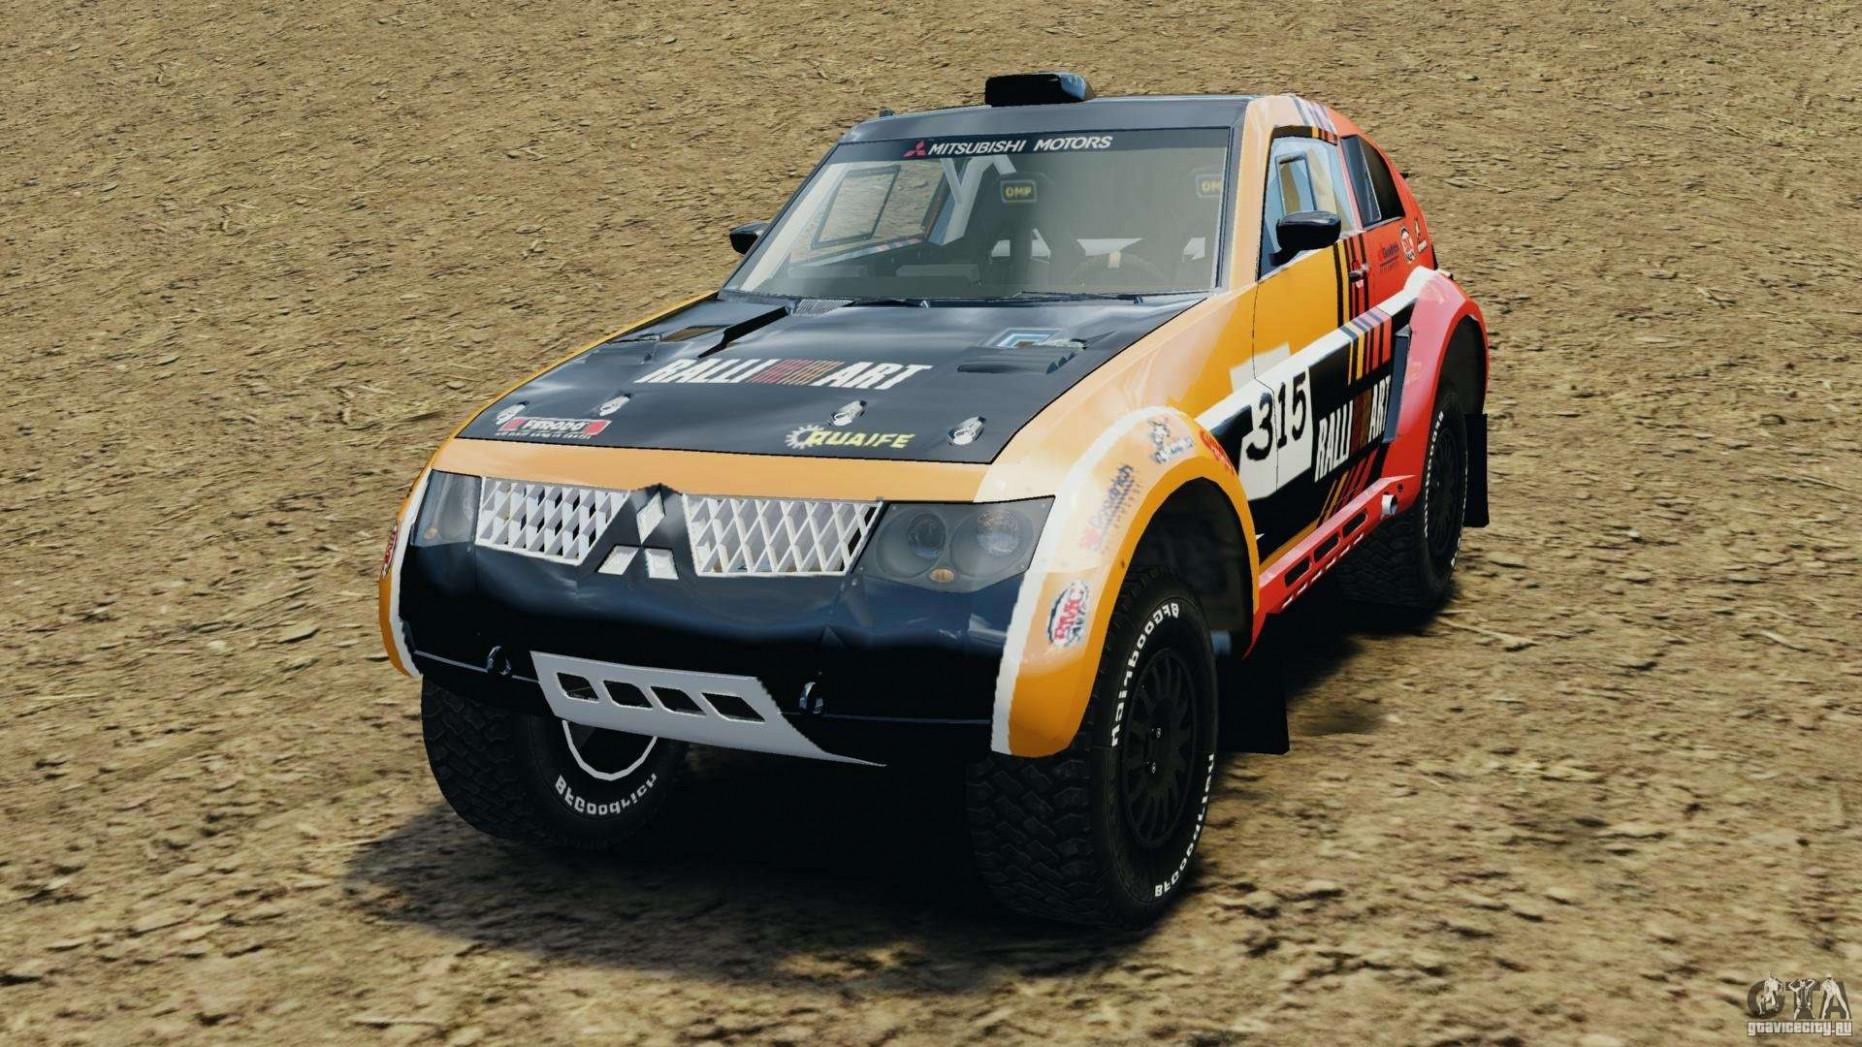 Redesign and Review Mitsubishi Dakar 2022